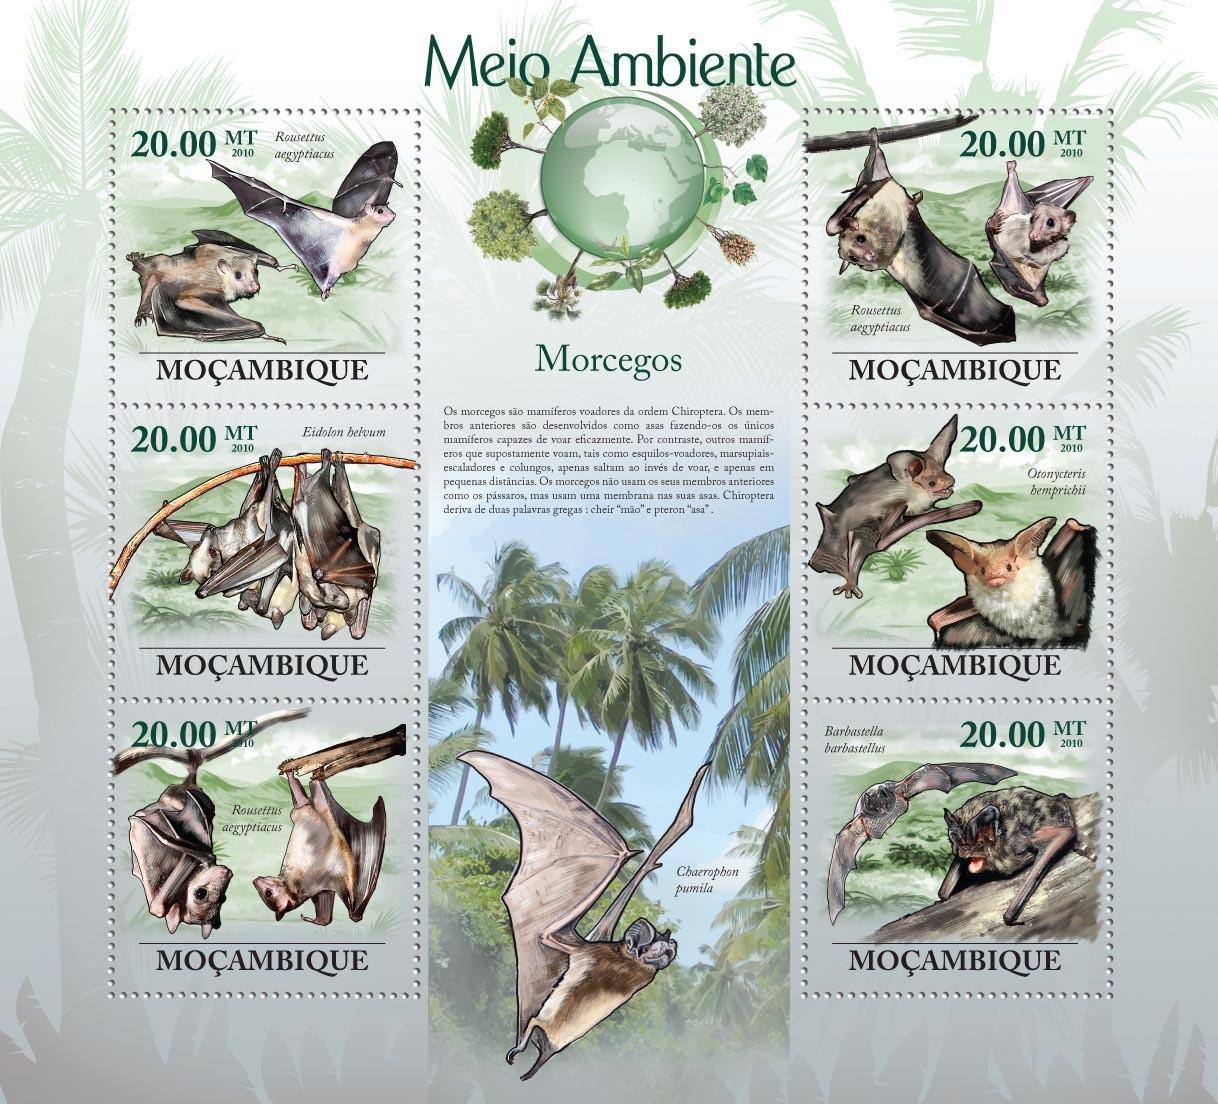 Bats( Rousettus aegyptiacus, Eidolon belvum, Rousettus aegyptiacus, etc..) - Issue of Mozambique postage Stamps